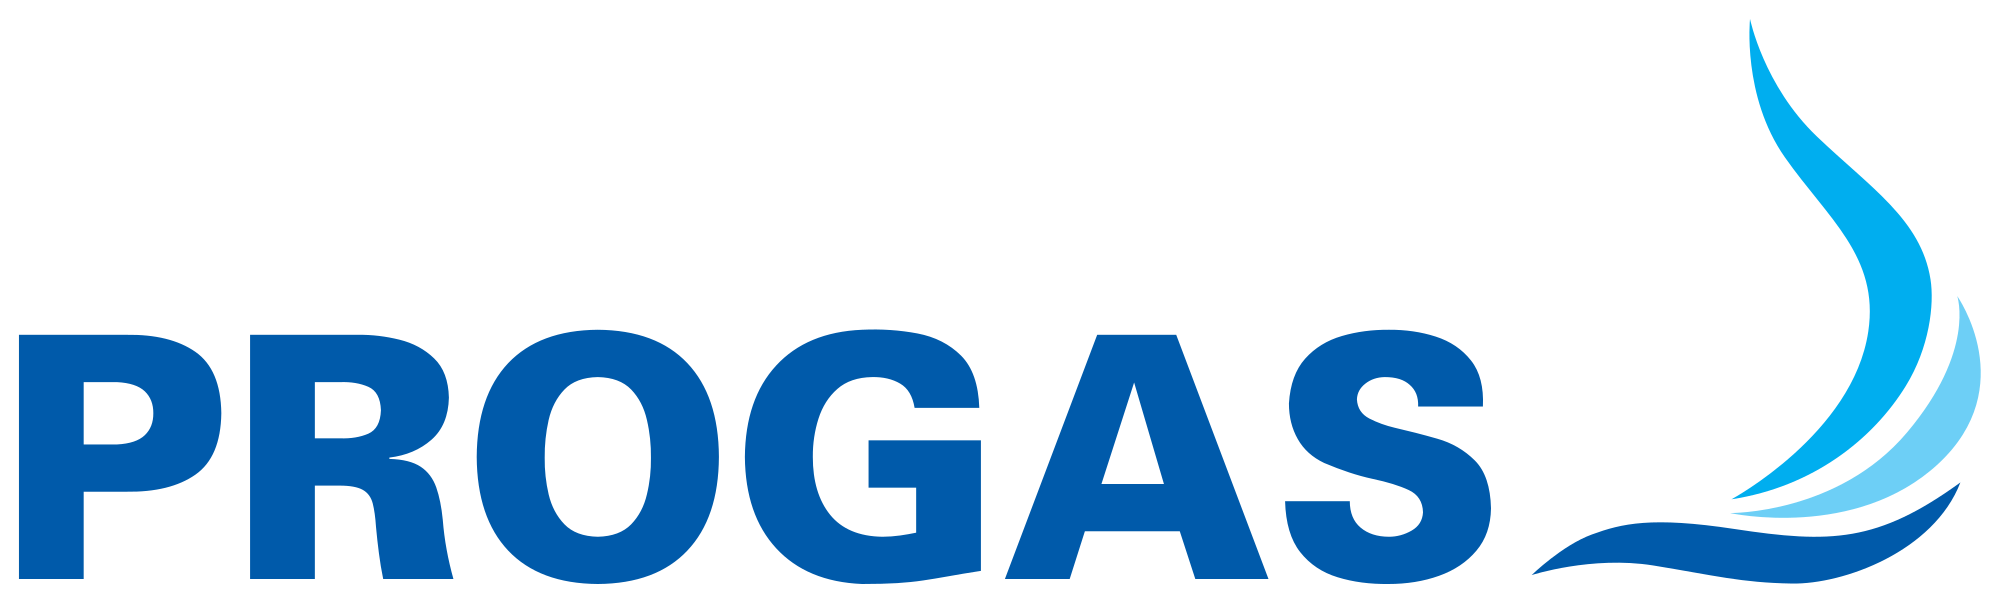 progas_logo